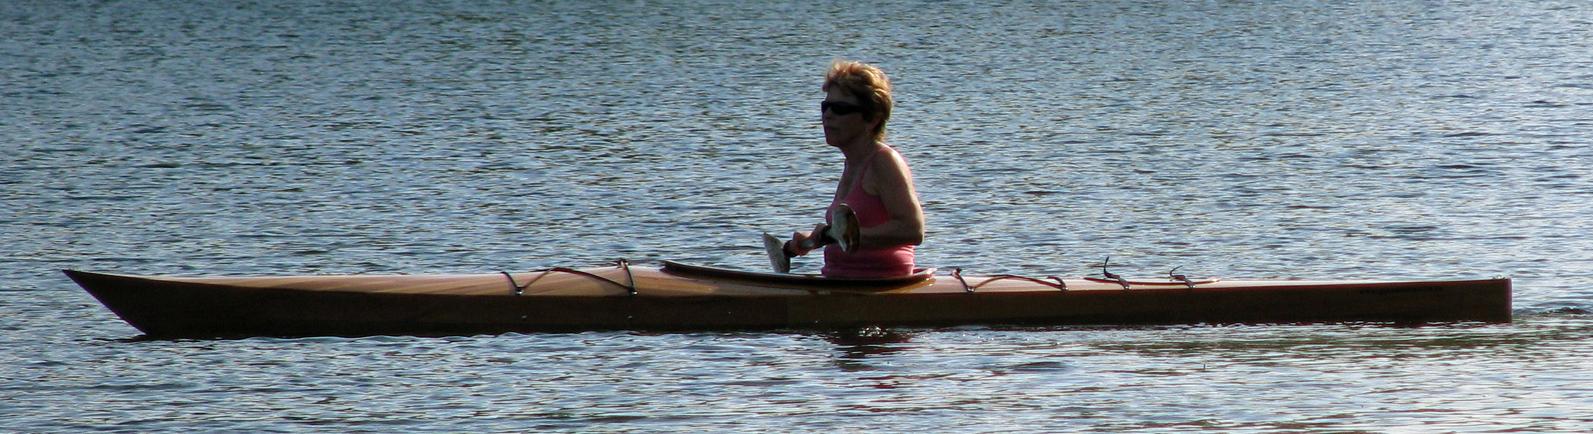 Kayaks: Sport 15 by Otto Vallinga Yacht Design - Image 3396